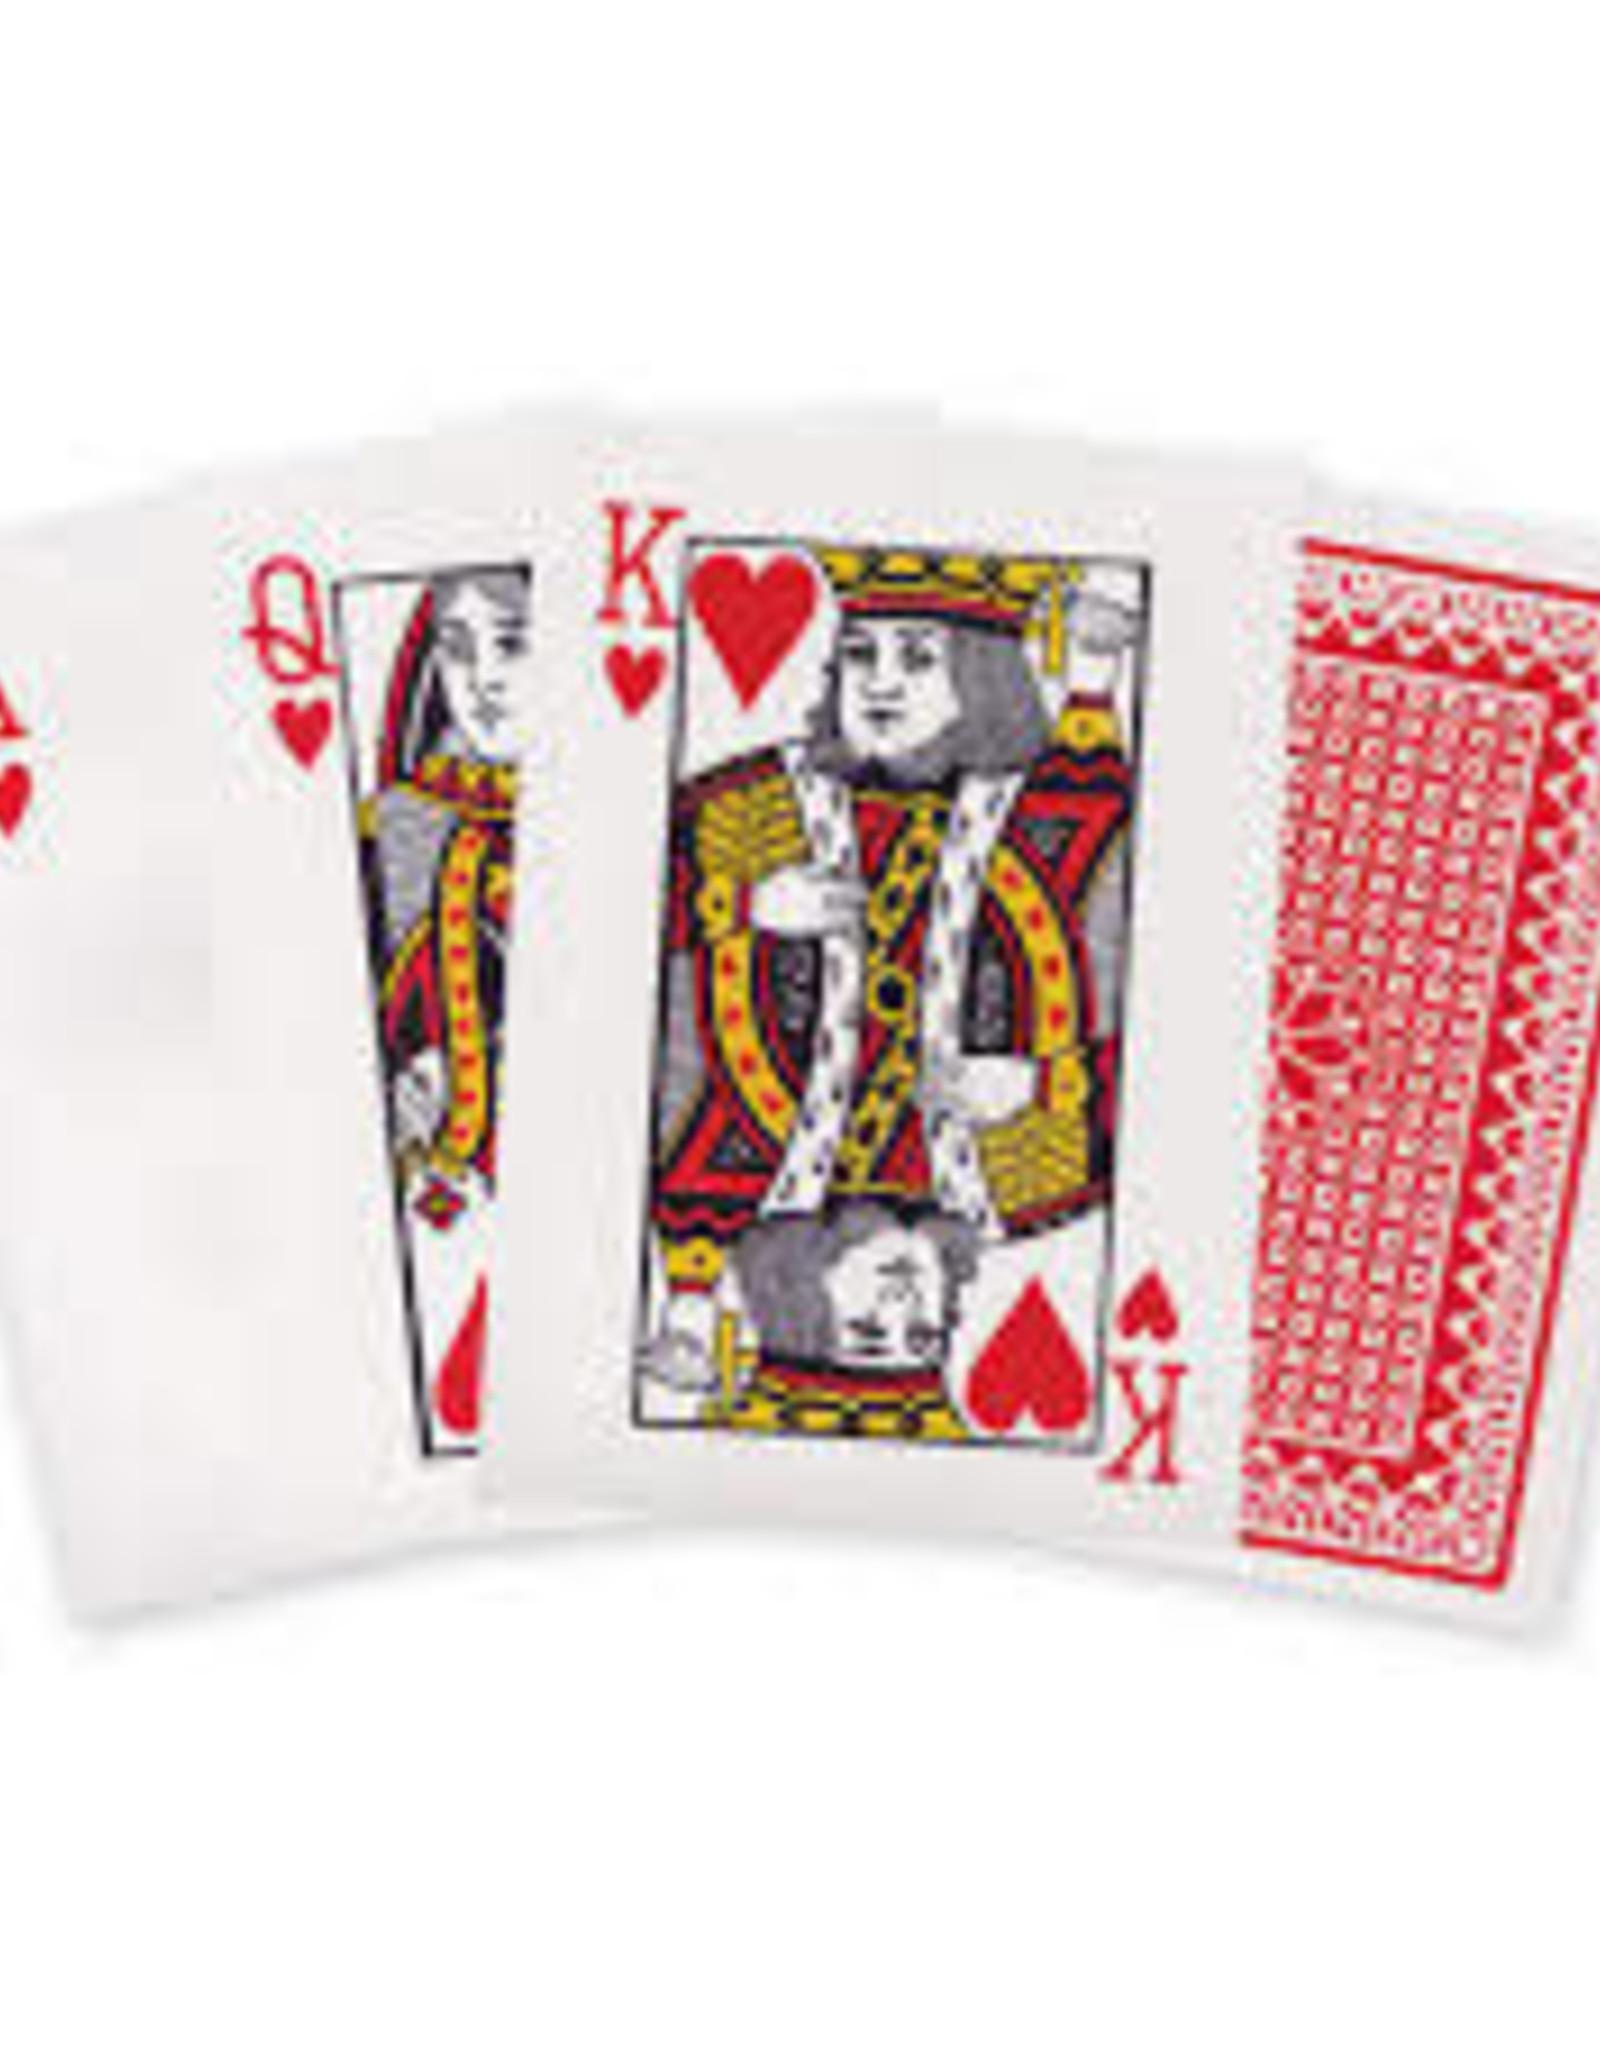 5X7IN. JUMBO PLAYING CARDS